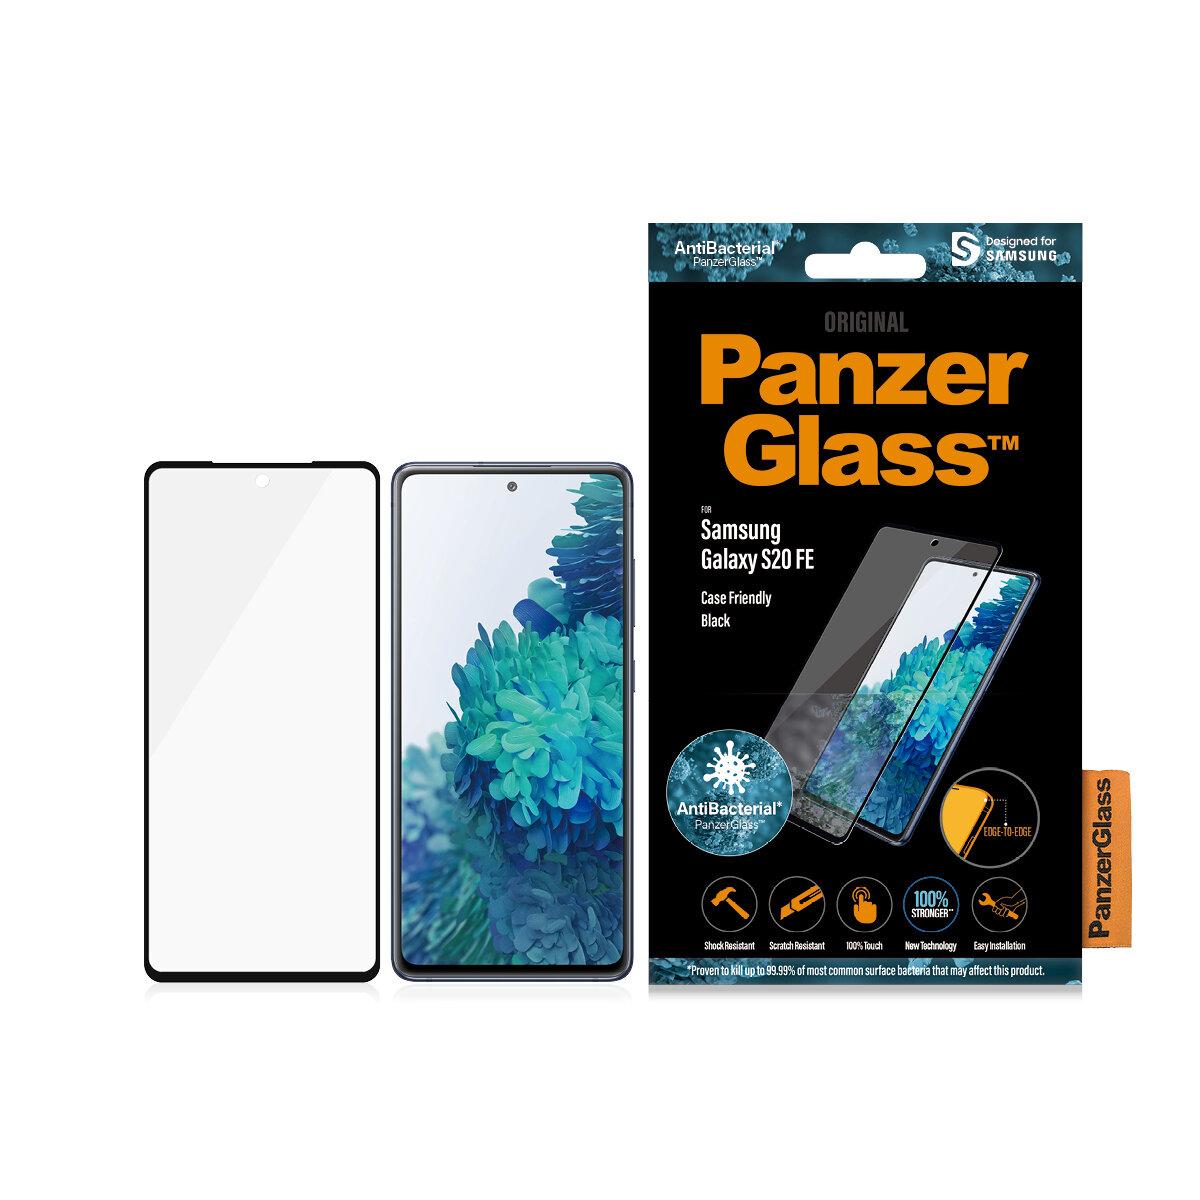 PanzerGlass Case Friendly for Galaxy S20 Fan Edition black